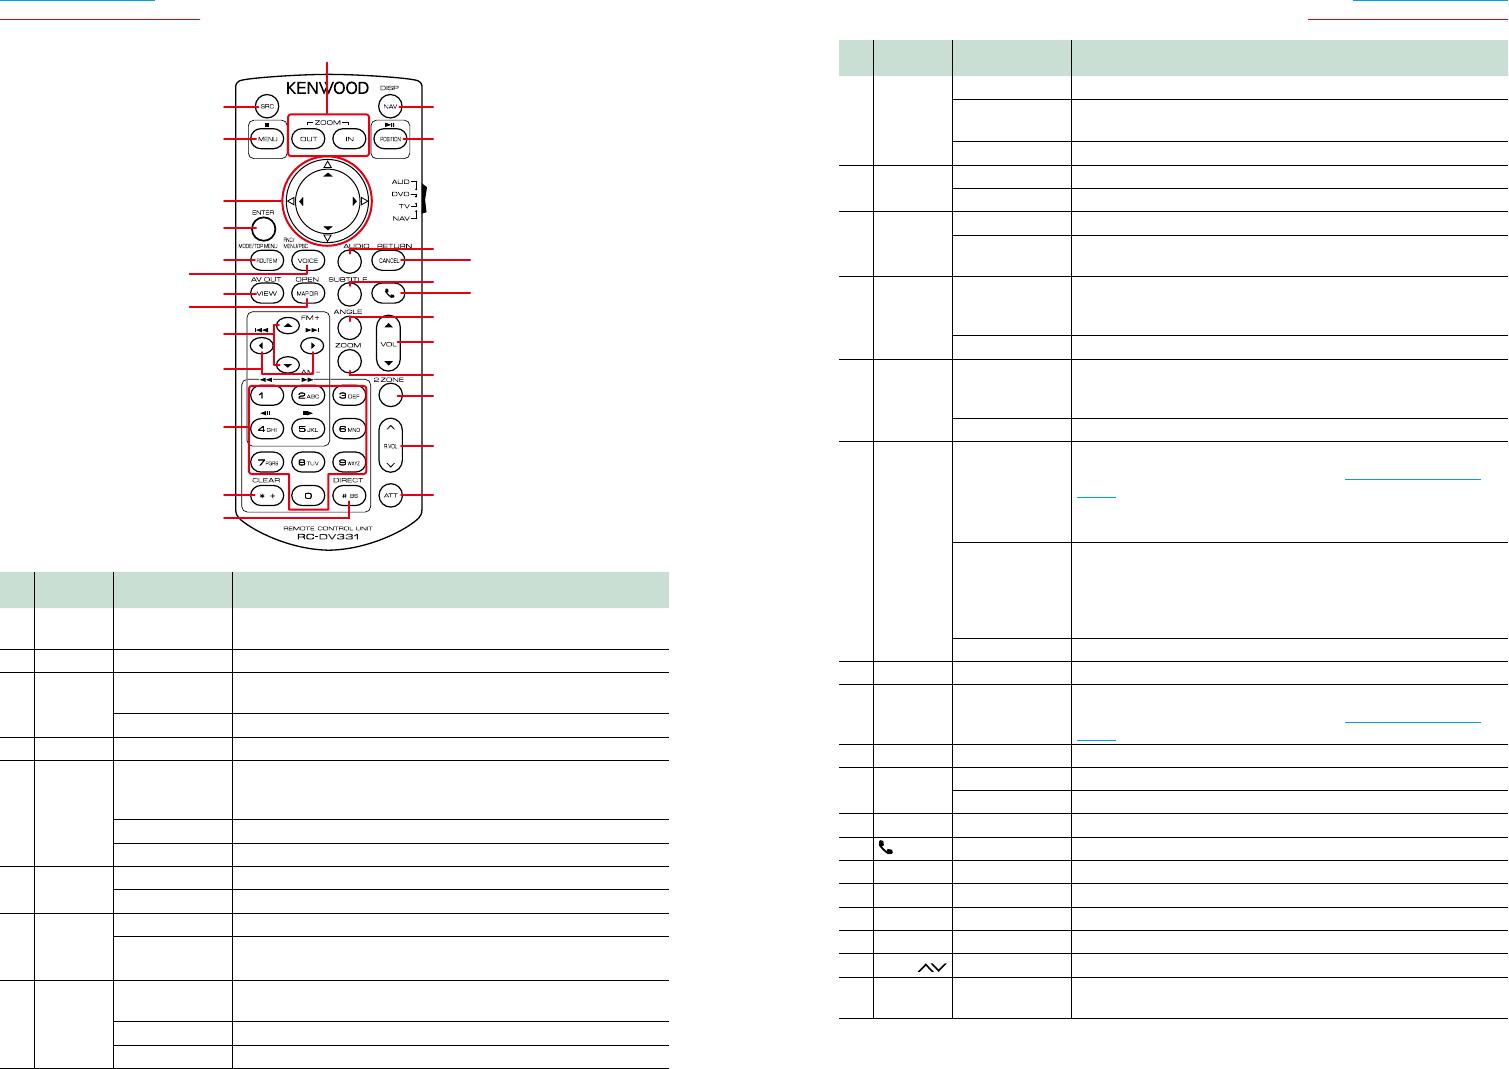 Kenwood Dnx 9210 Bt Instruction Manual Navigation Light Wiring For Dual Stationsnavlights001jpg 9494 95